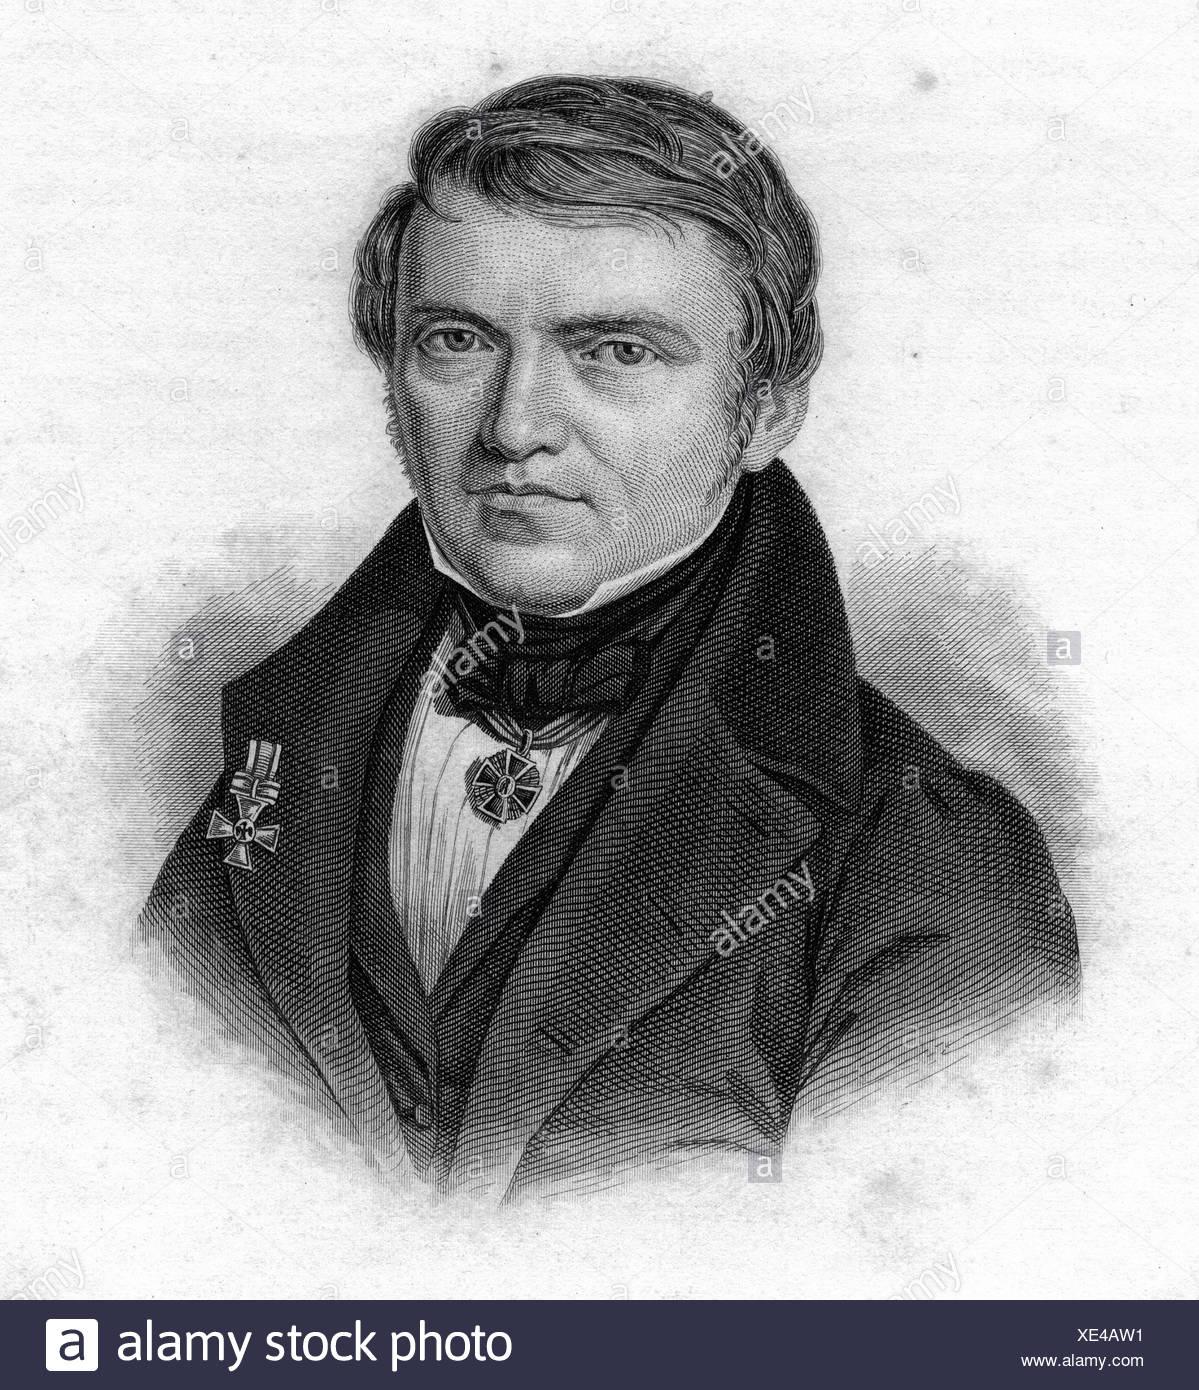 Ehrenberg, Christian Gottfried, 19.4.1795 - 27.6.1876, German biologist, zoologist, portrait, steel engraving, 19th century, voy Stockbild